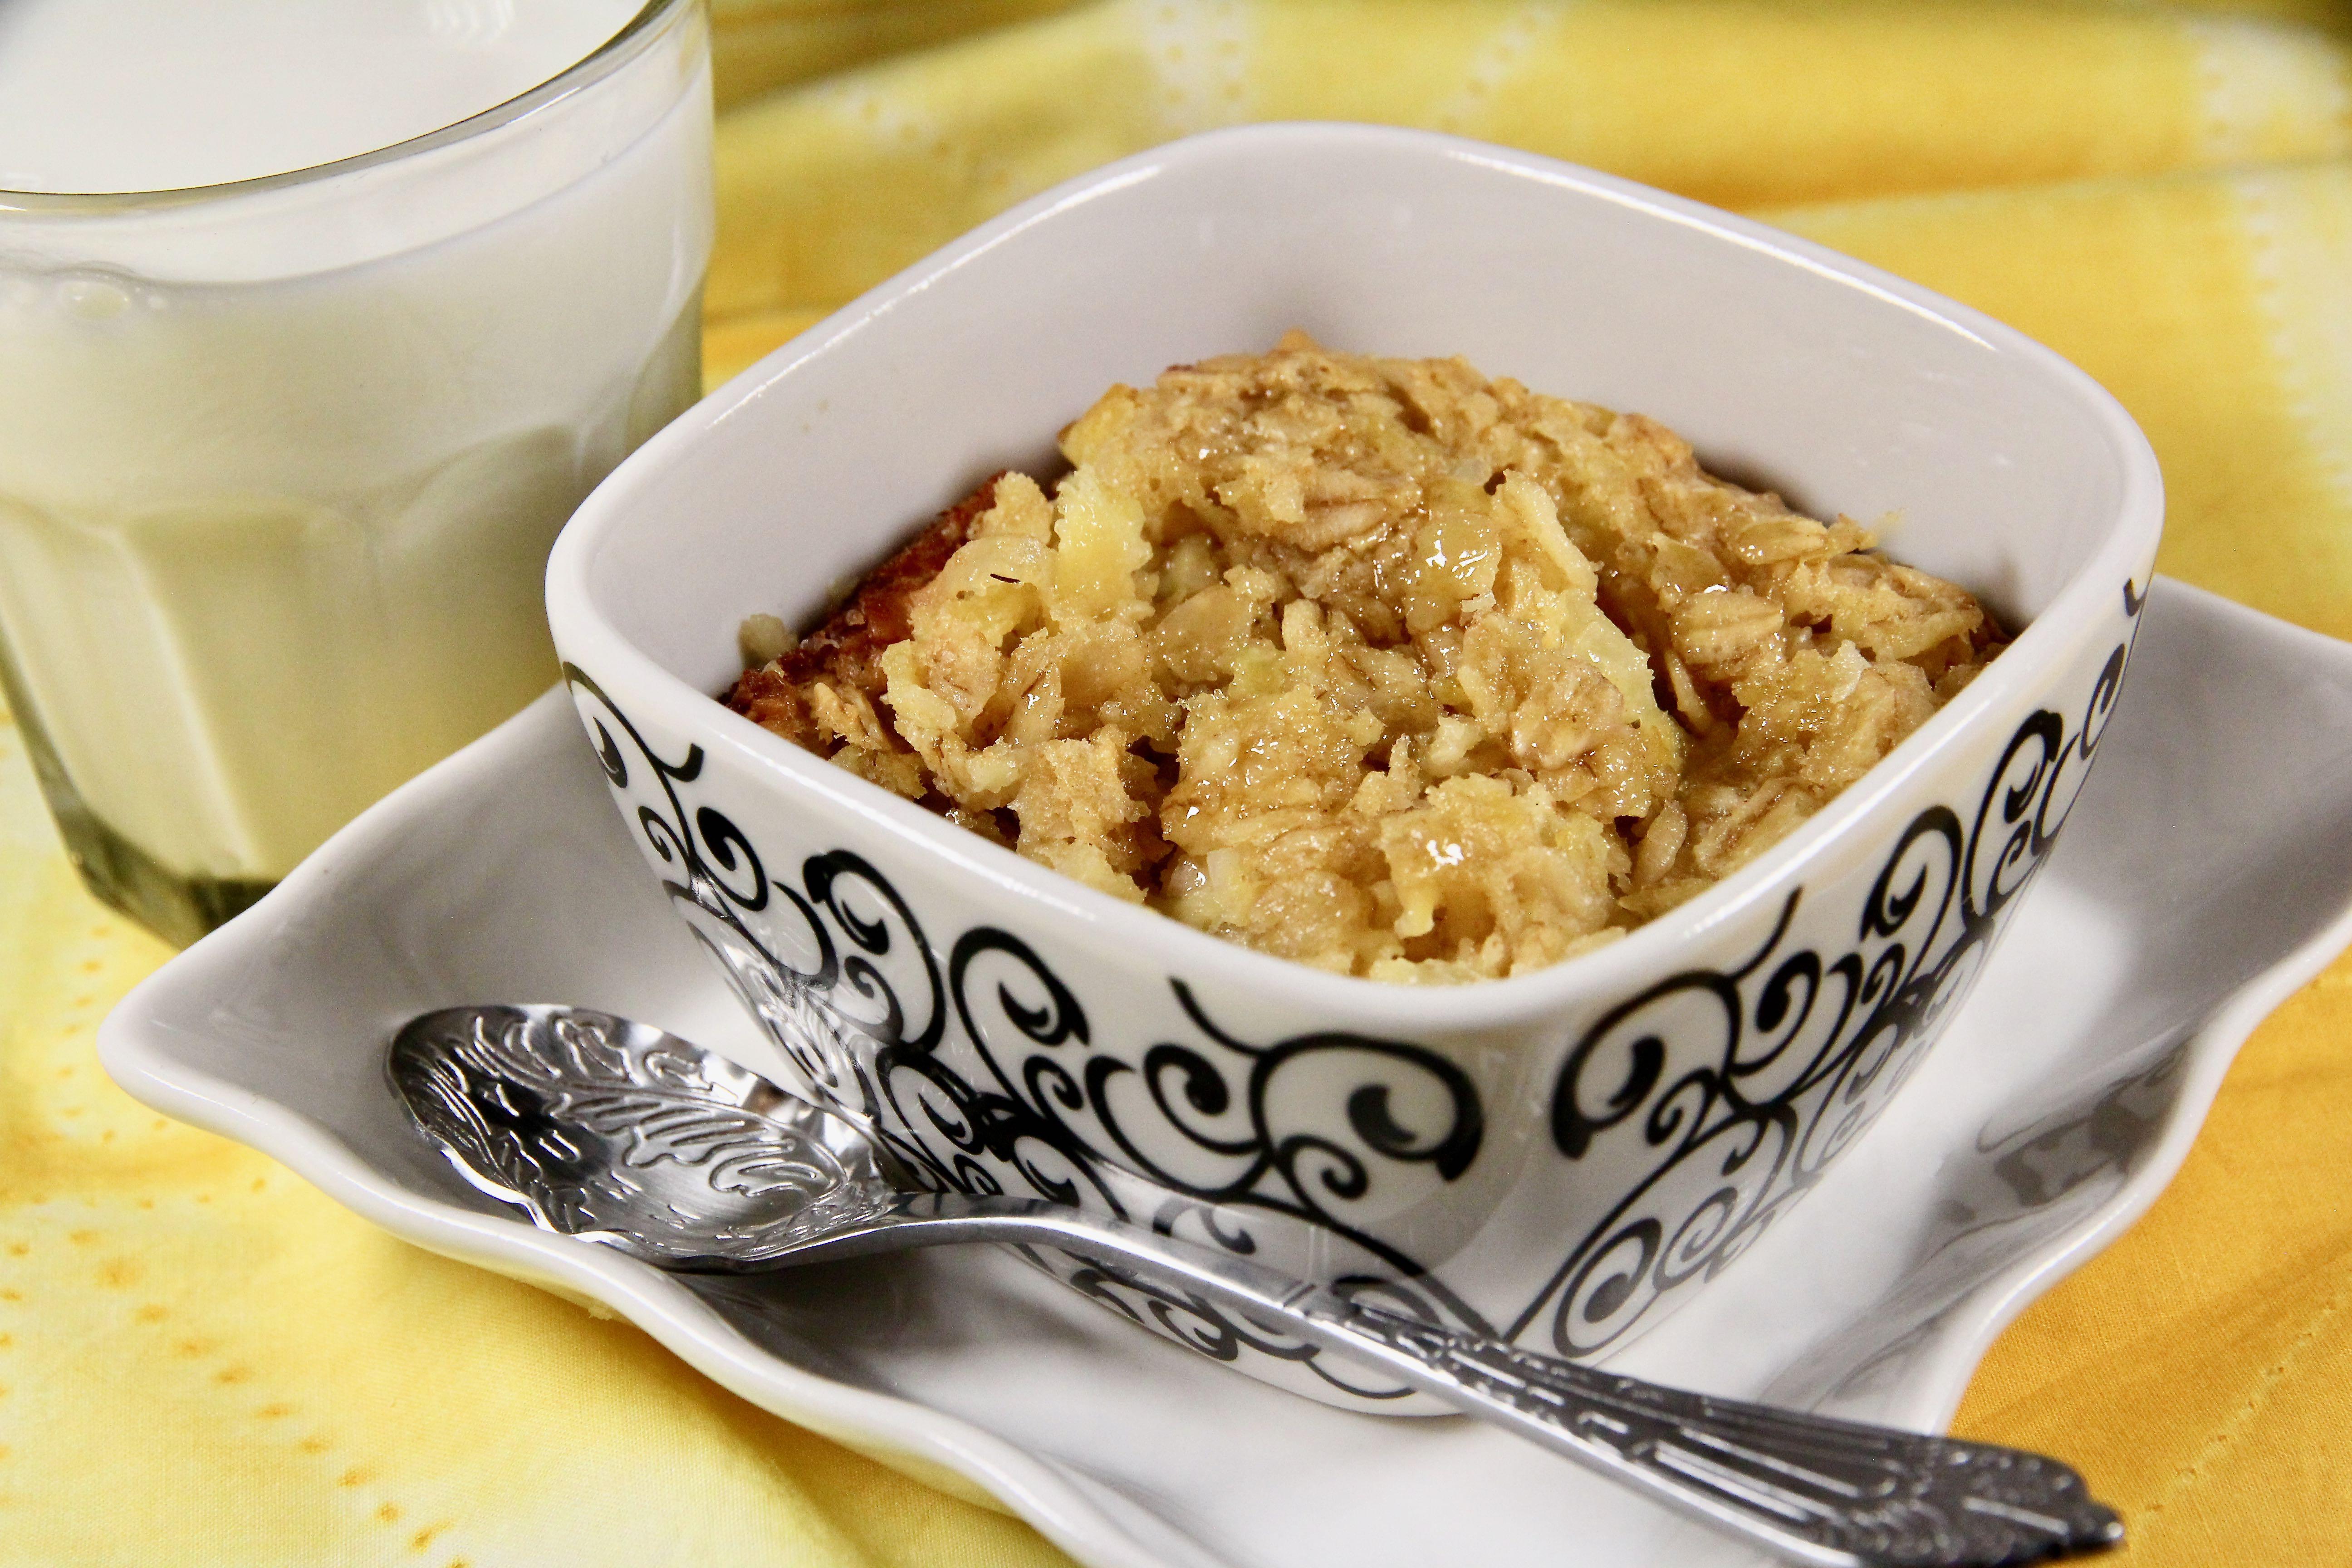 Pineapple-Coconut Baked Oatmeal